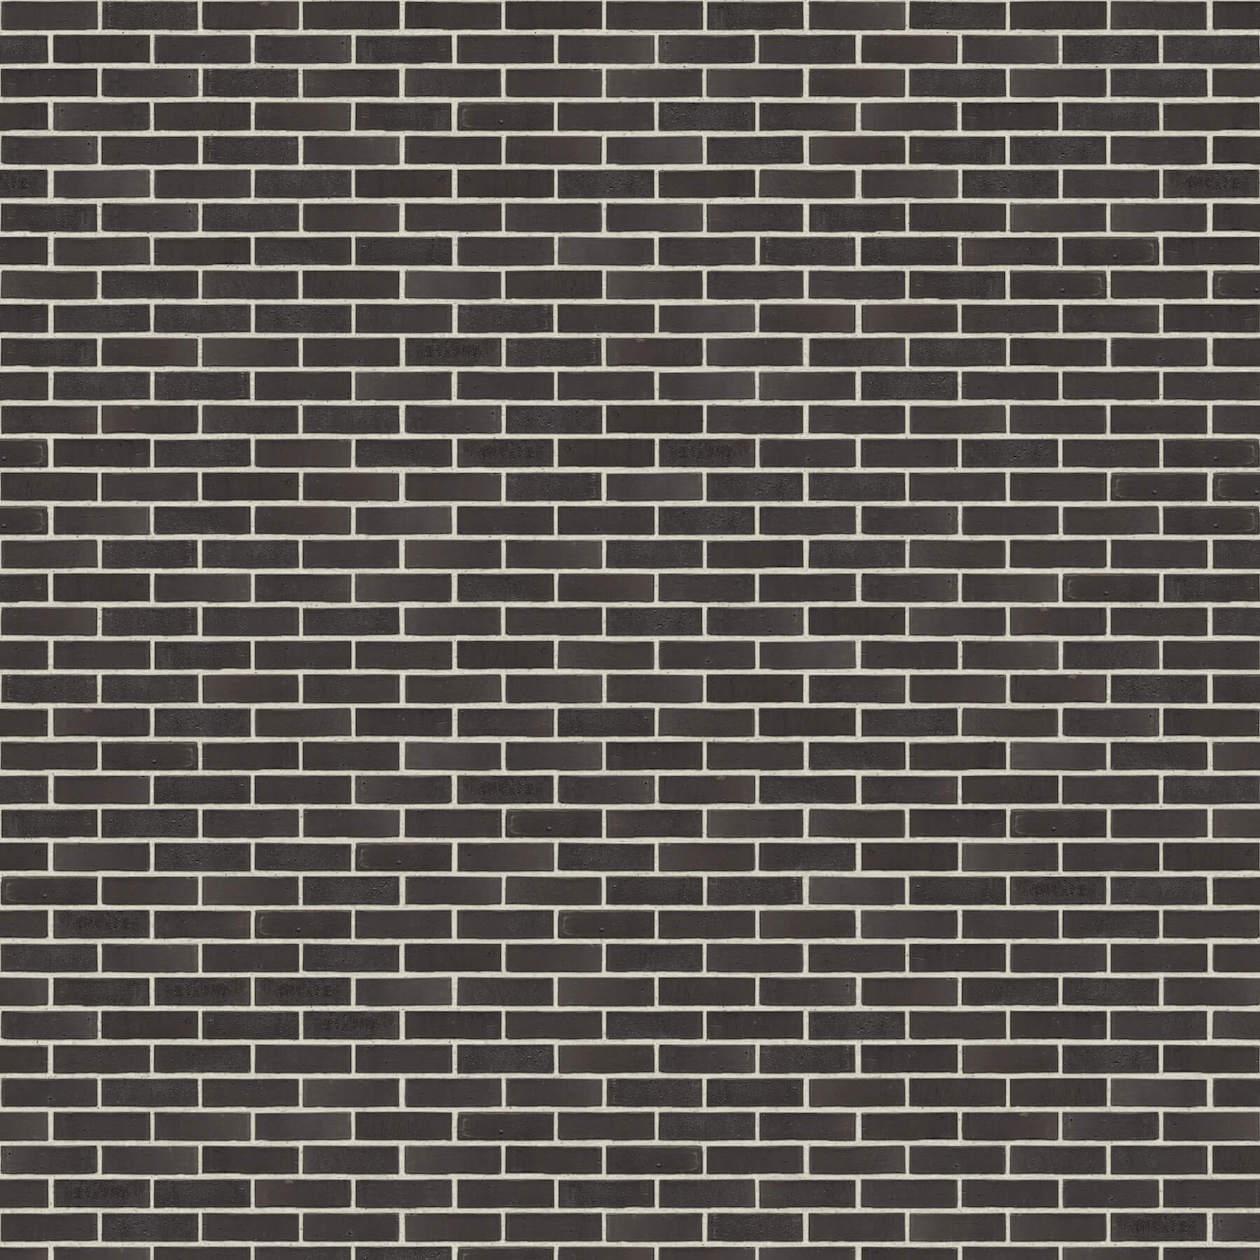 Puna-cigla-FeldHaus-Klinker-brick-house-Beograd-nf-k-706-Bela Fuga